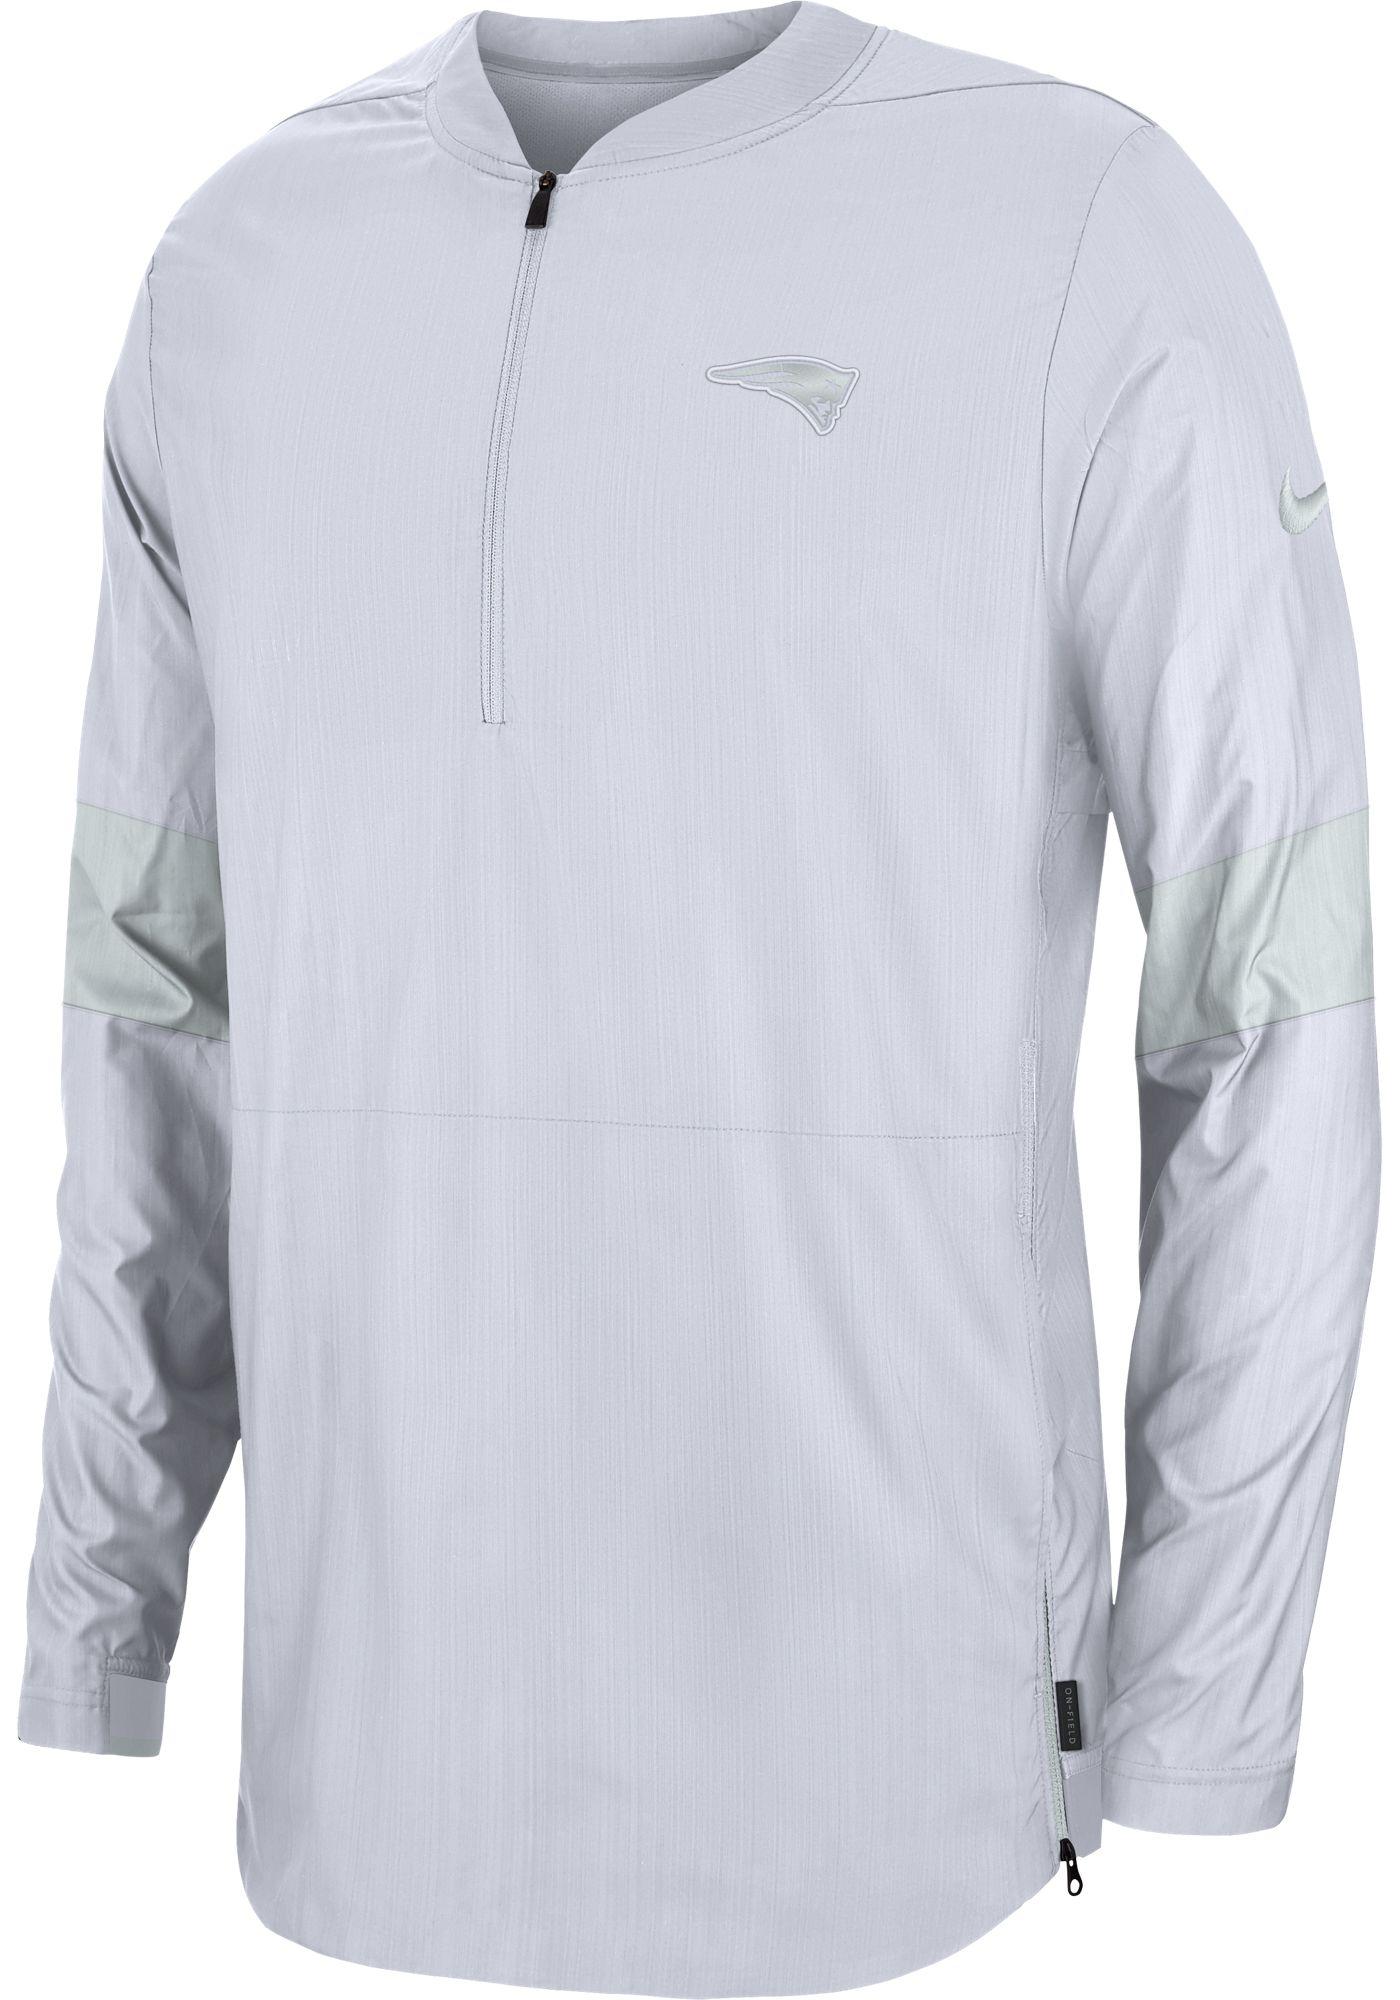 Nike Men's New England Patriots Sideline Coach White Half-Zip Performance Jacket